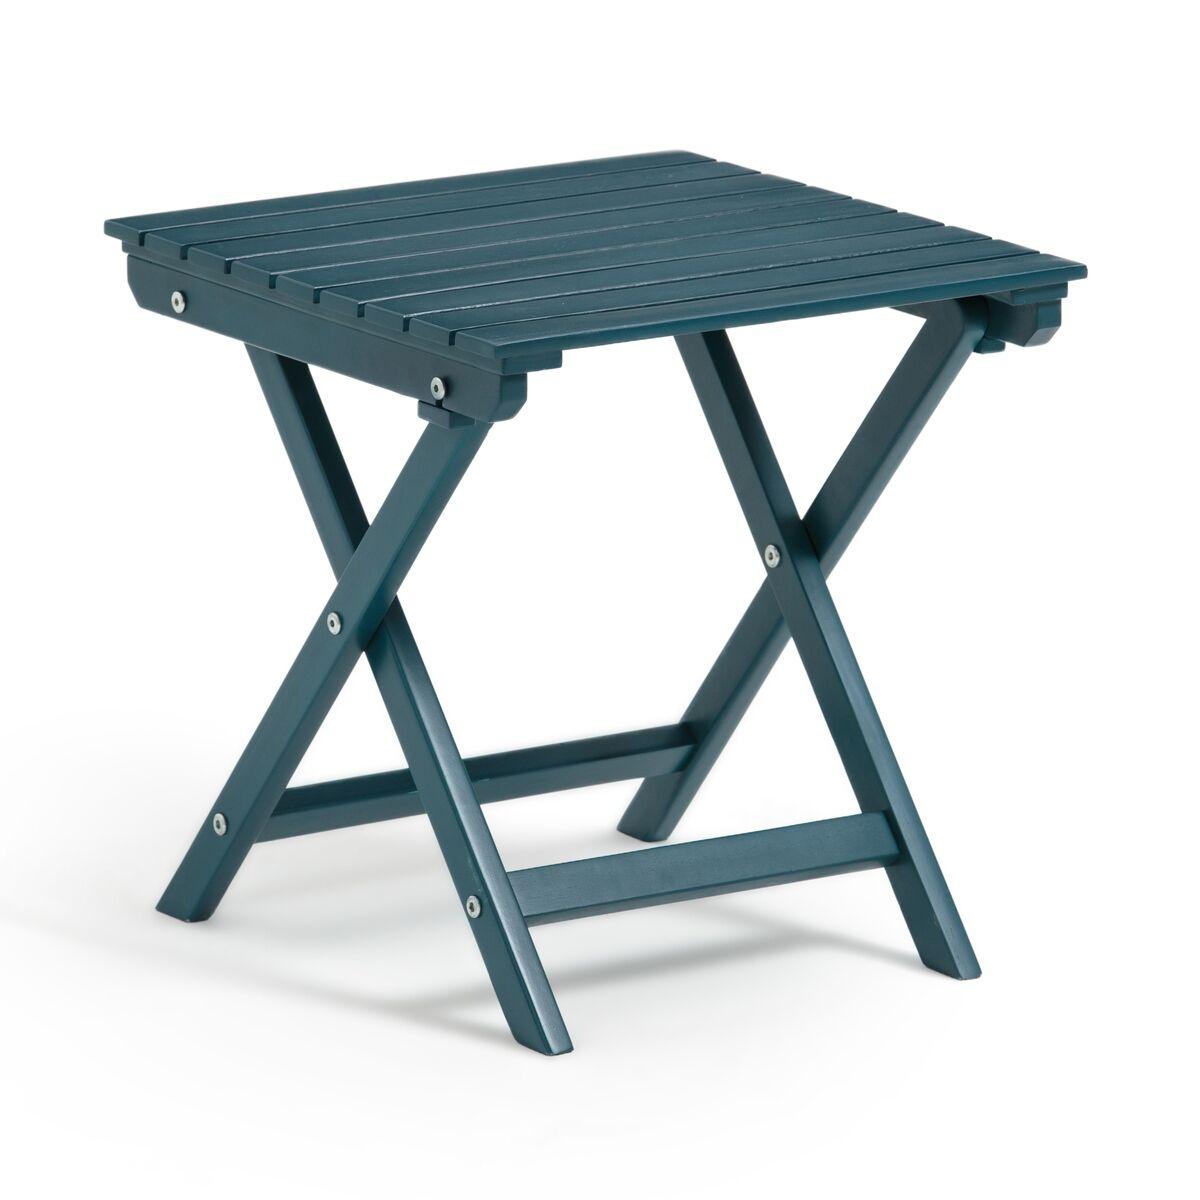 LA REDOUTE INTERIEURS Table basse pliante Zeda en acacia